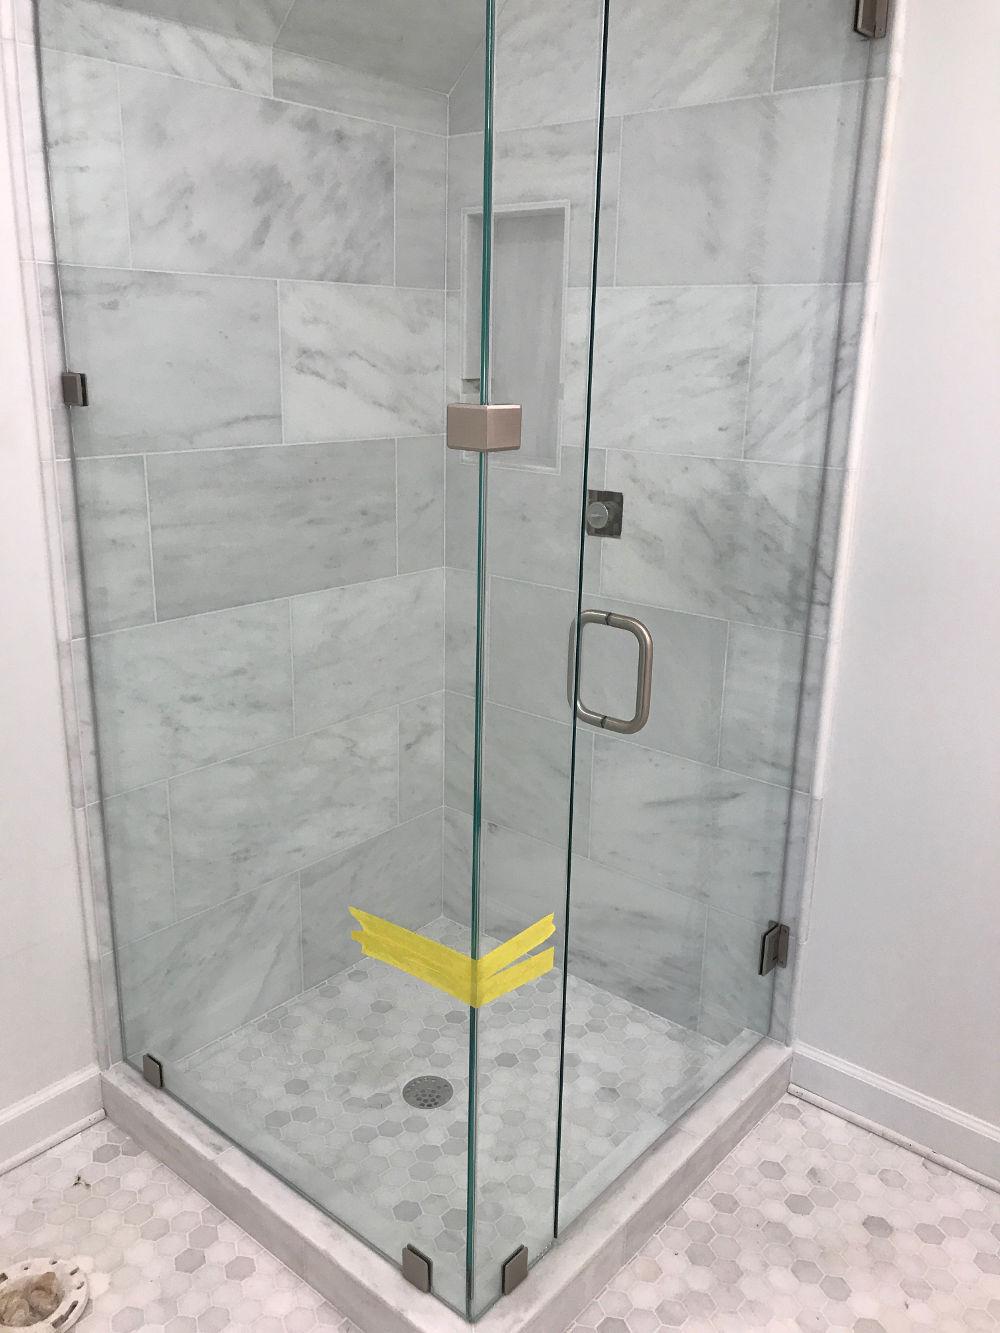 Frameless Shower Door Project August 2018 Clarity Glass